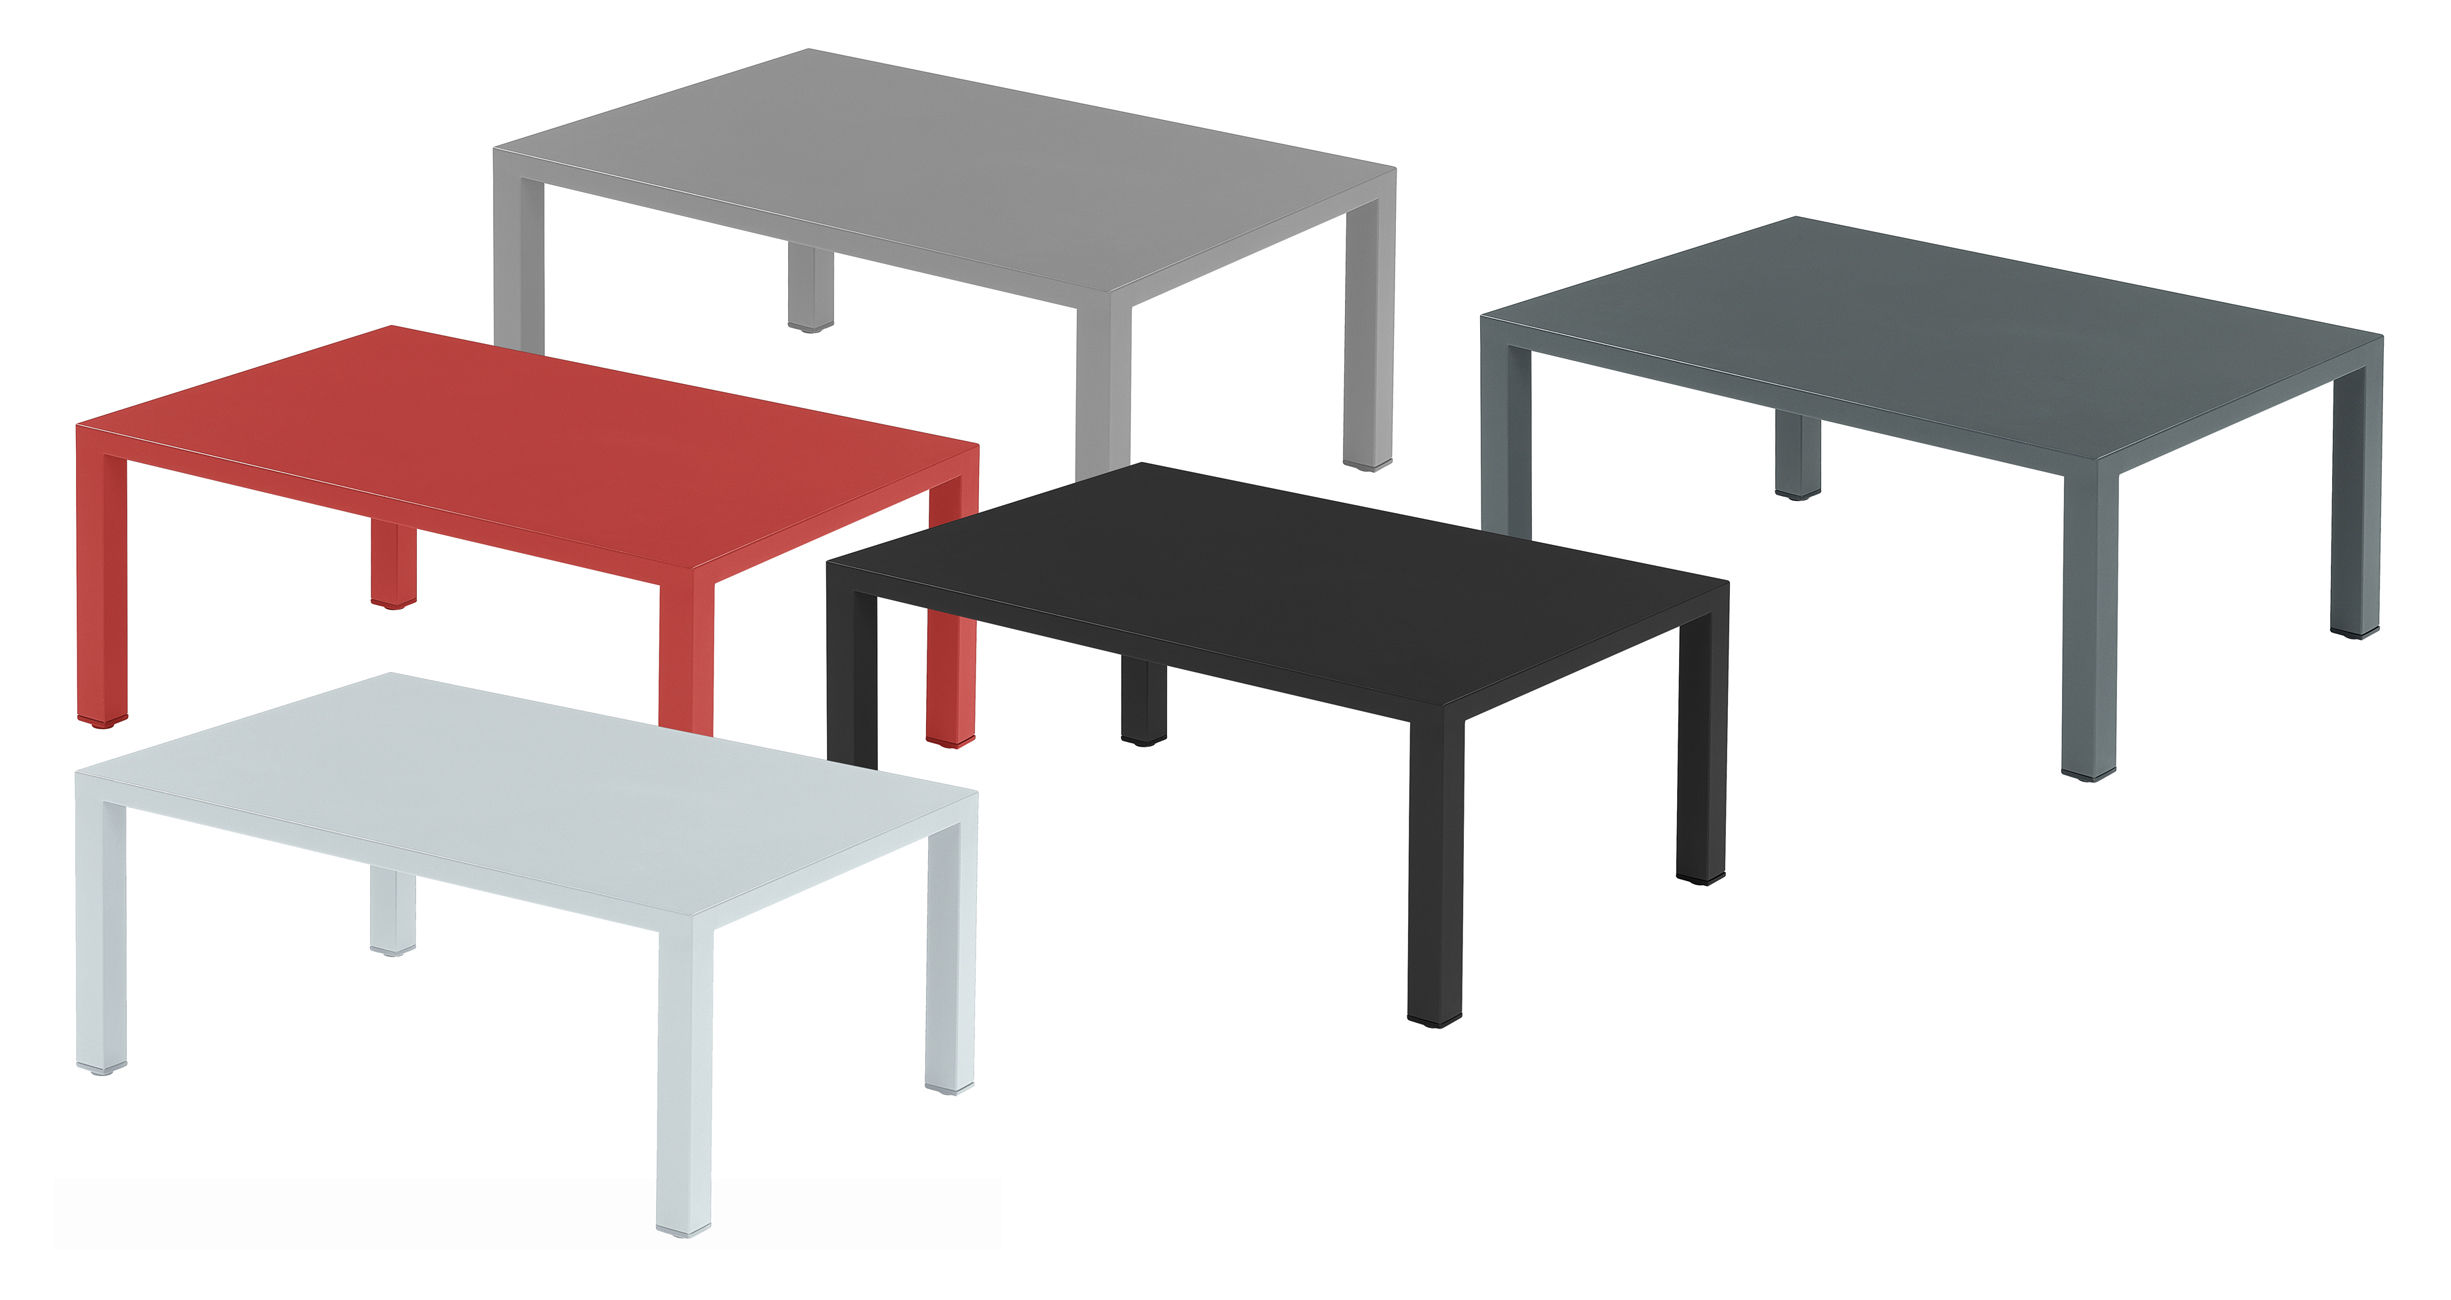 Table basse round m ta l 70 x 100 cm fer ancien emu for Table cuisine 70 x 100